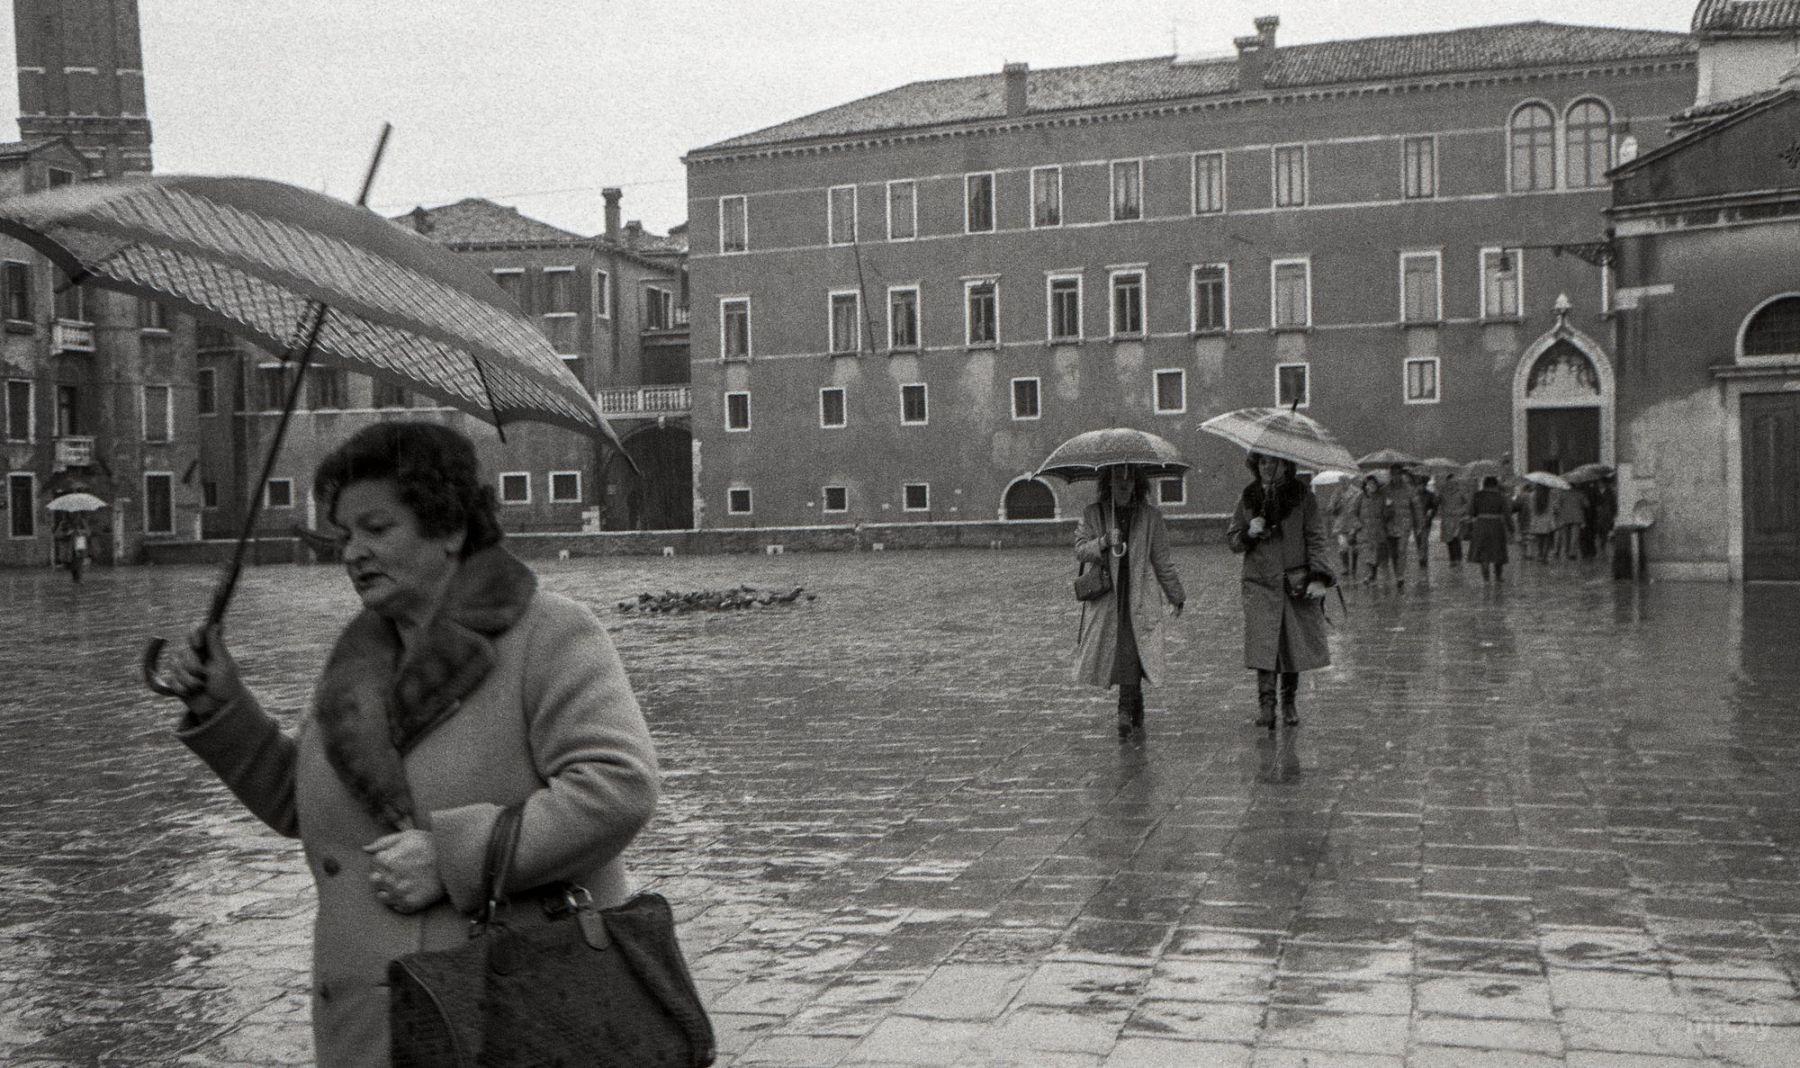 MichelAycaguer-Venise-AquaAlta-Noel-1981-32